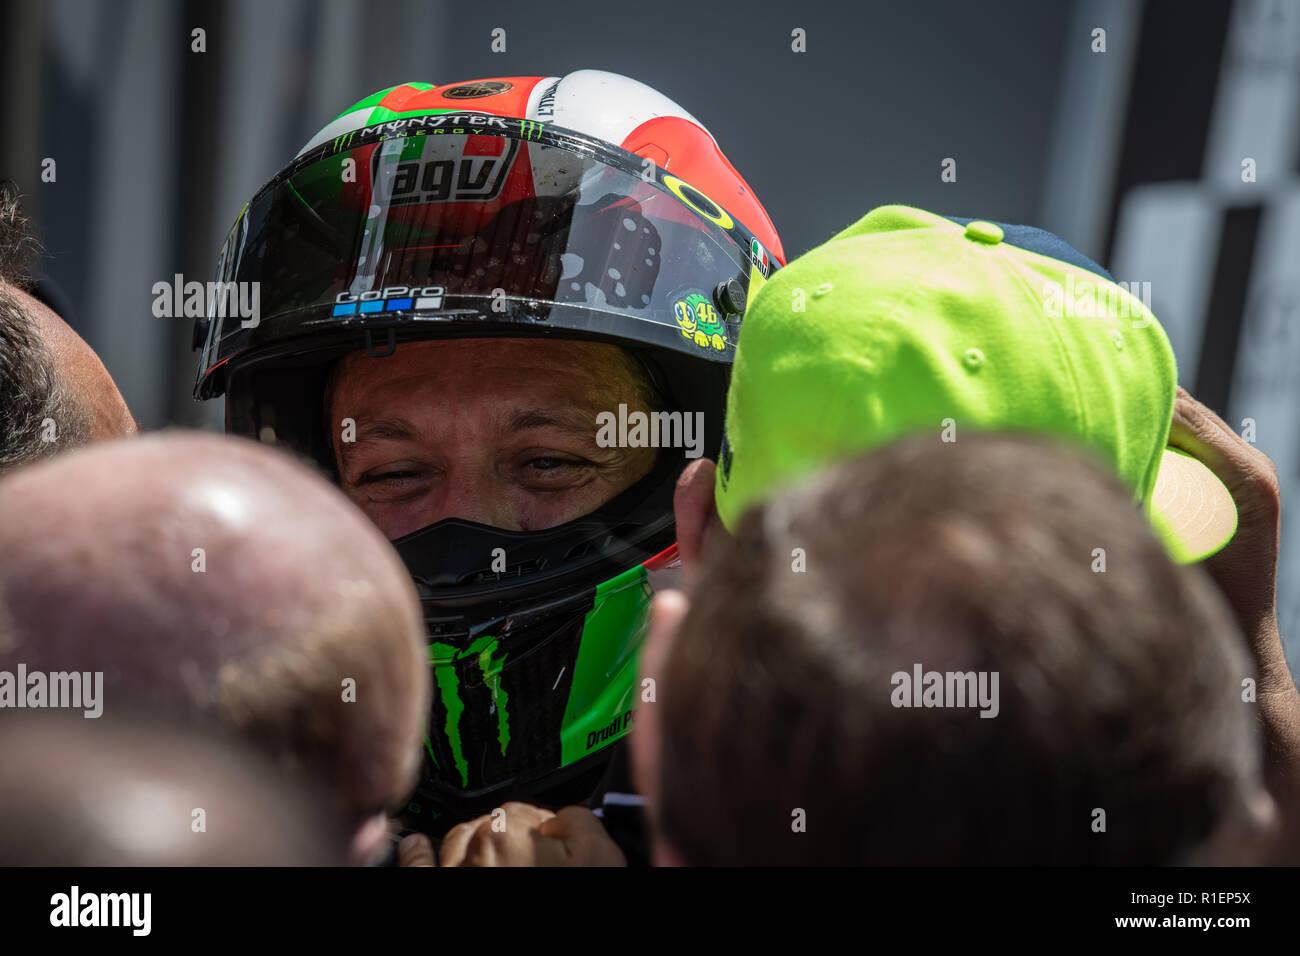 Valentino Rossi after MotoGP race in Mugello Stock Photo